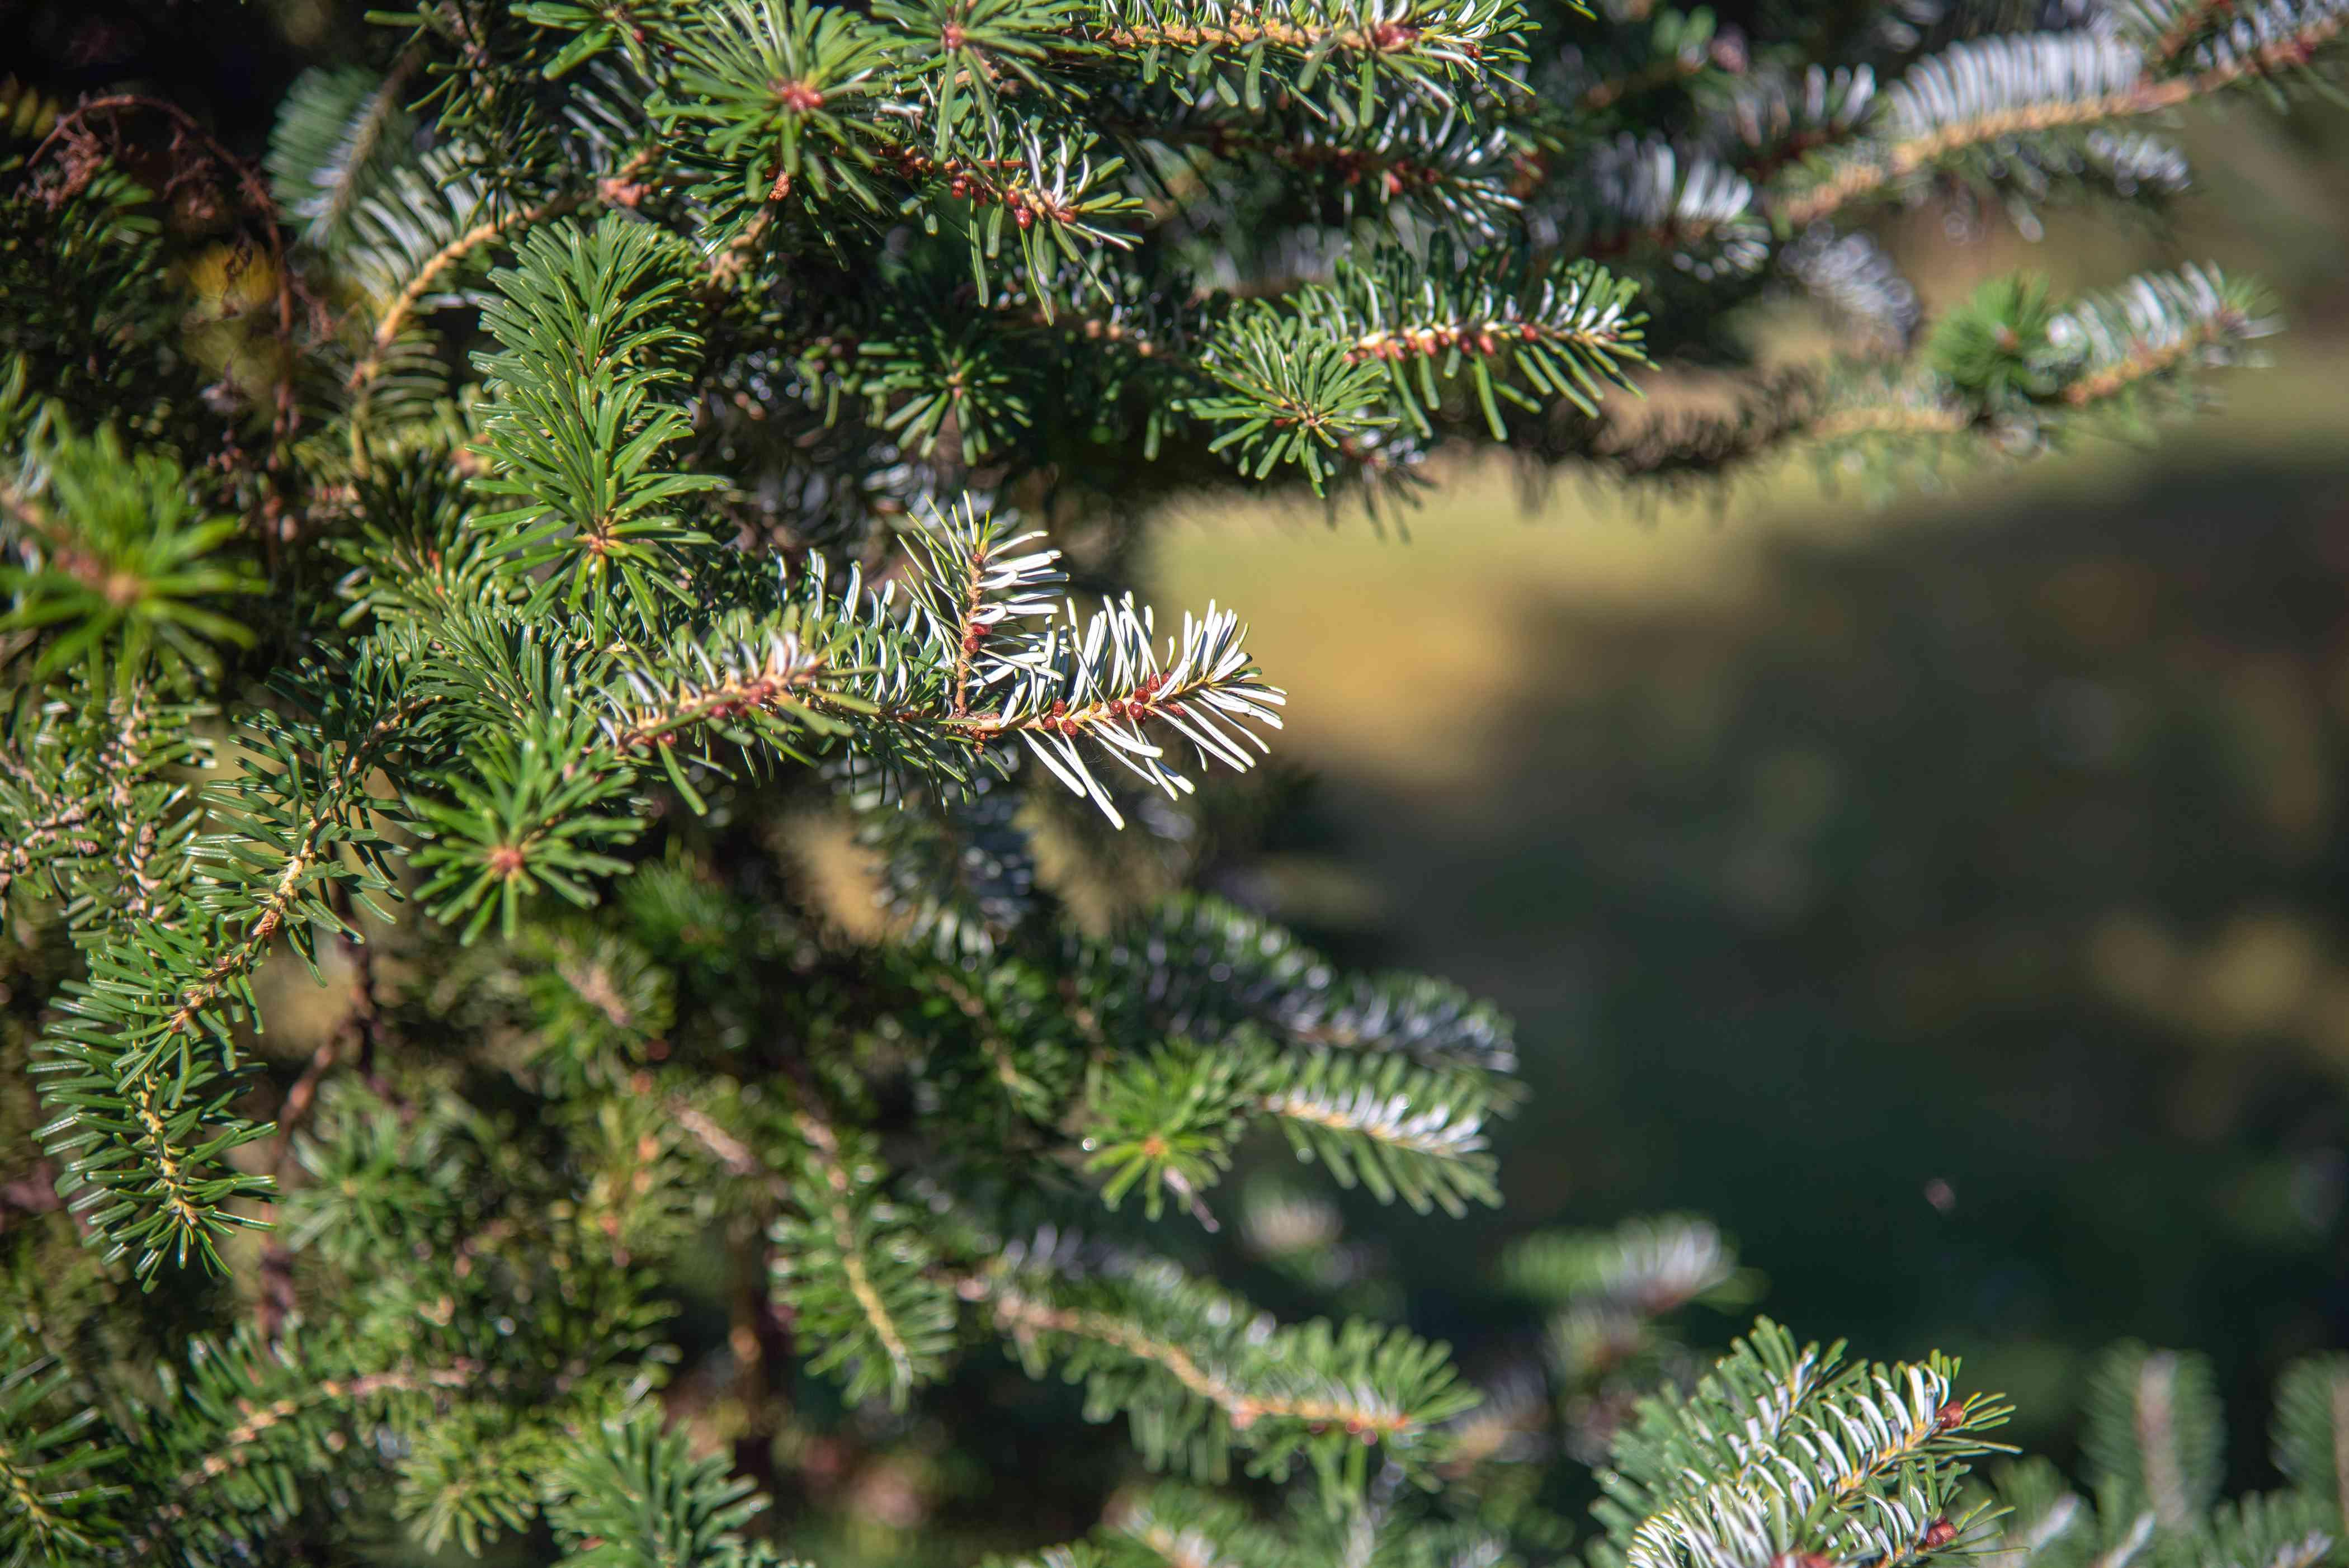 Balsam fir tree branch with short green and gray-green needles in sunlight closeup